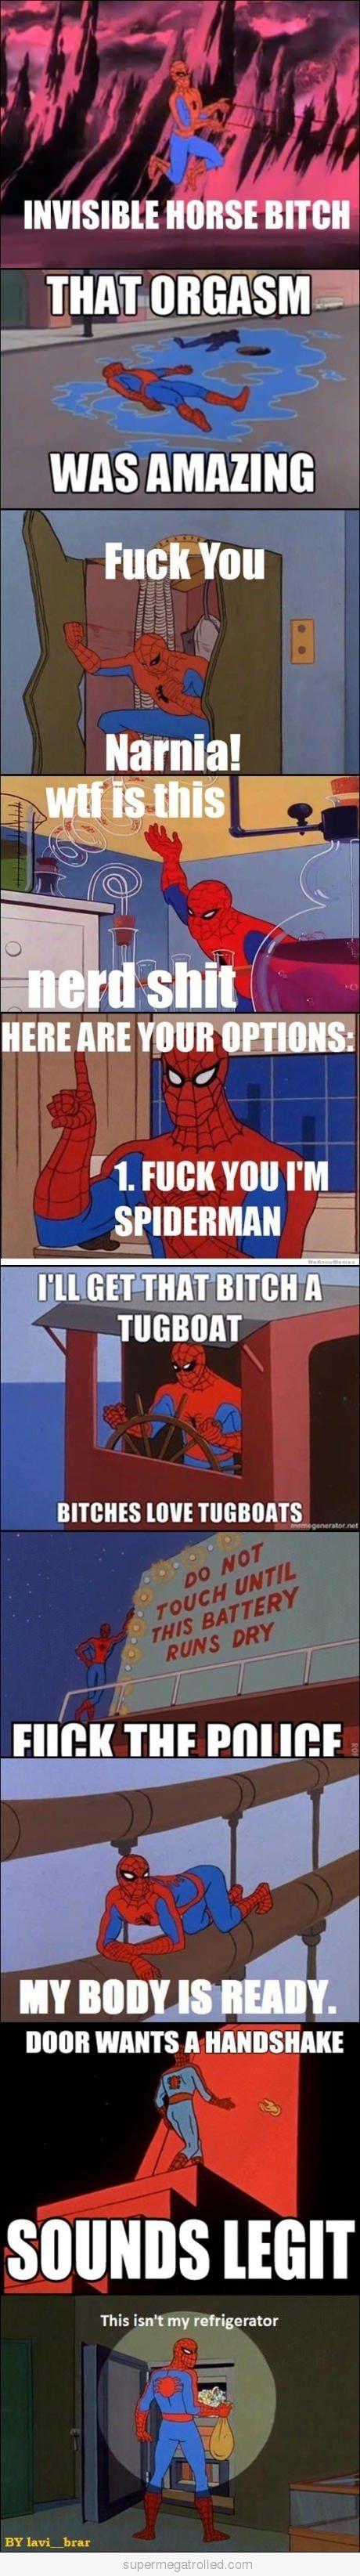 Spiderman Meme Funny Junk : Best of spiderman part meme and